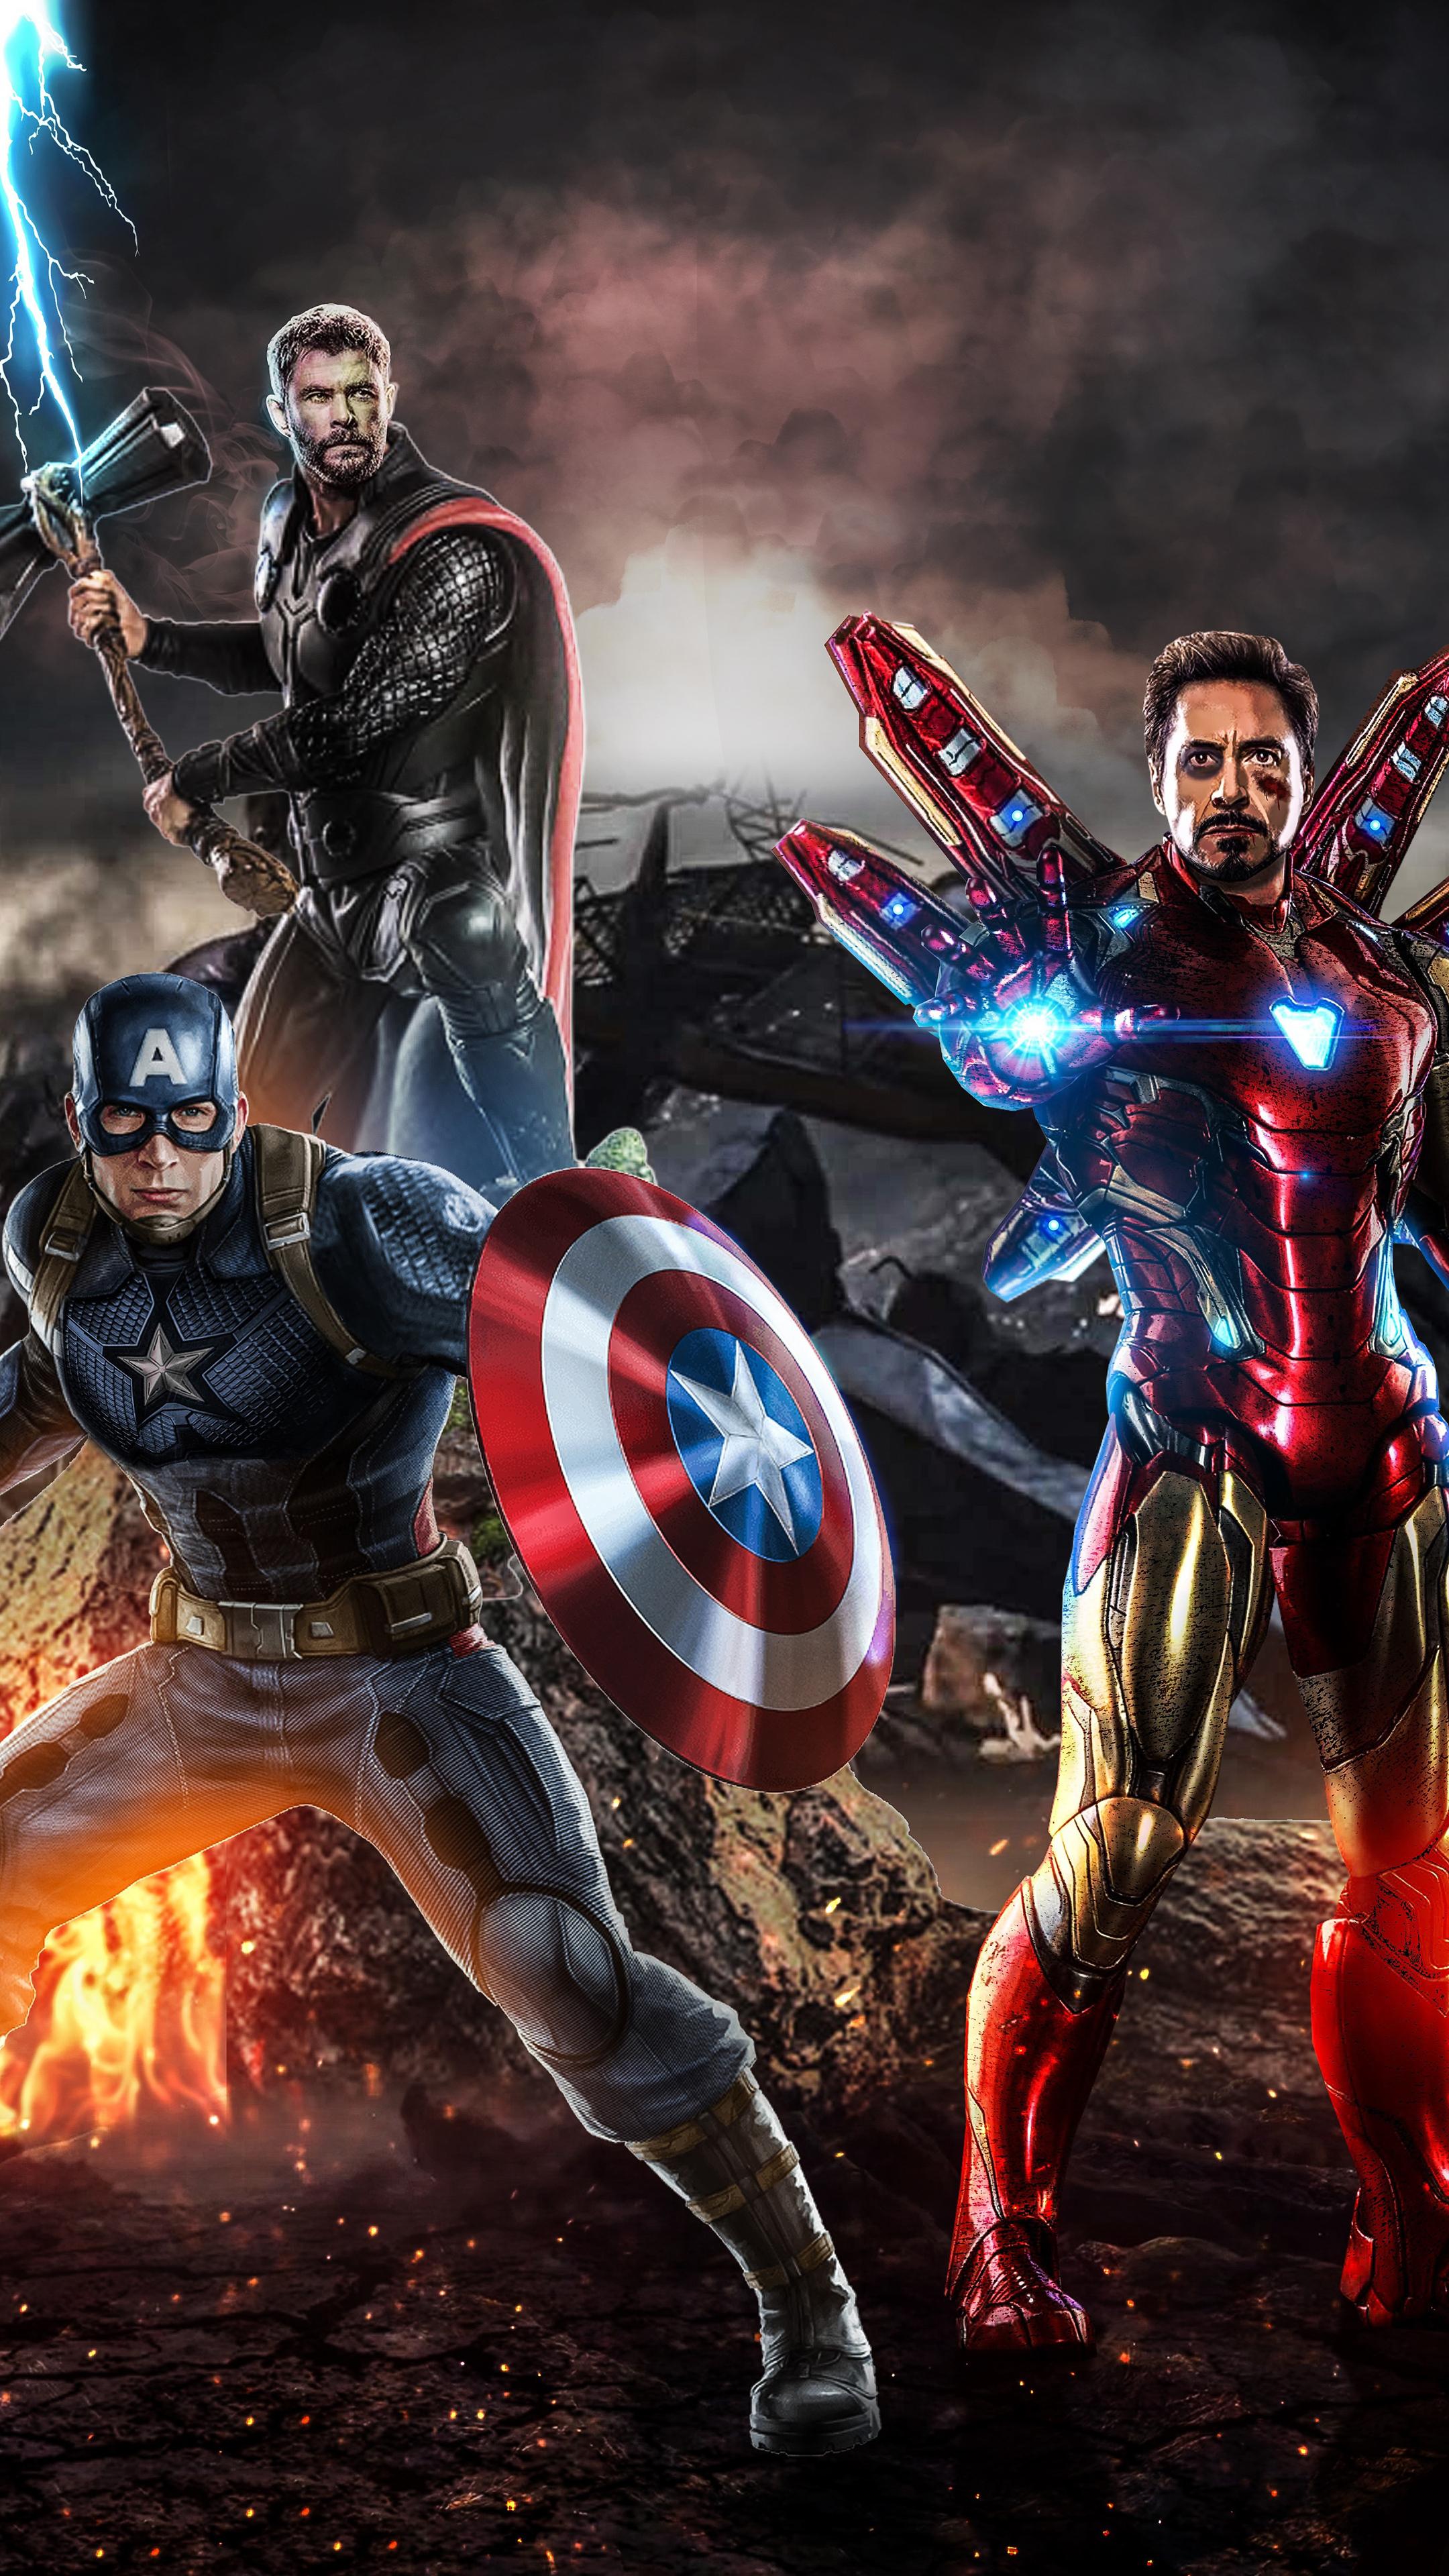 2160x3840 Avengers Endgame The Big Three Sony Xperia X,XZ ...